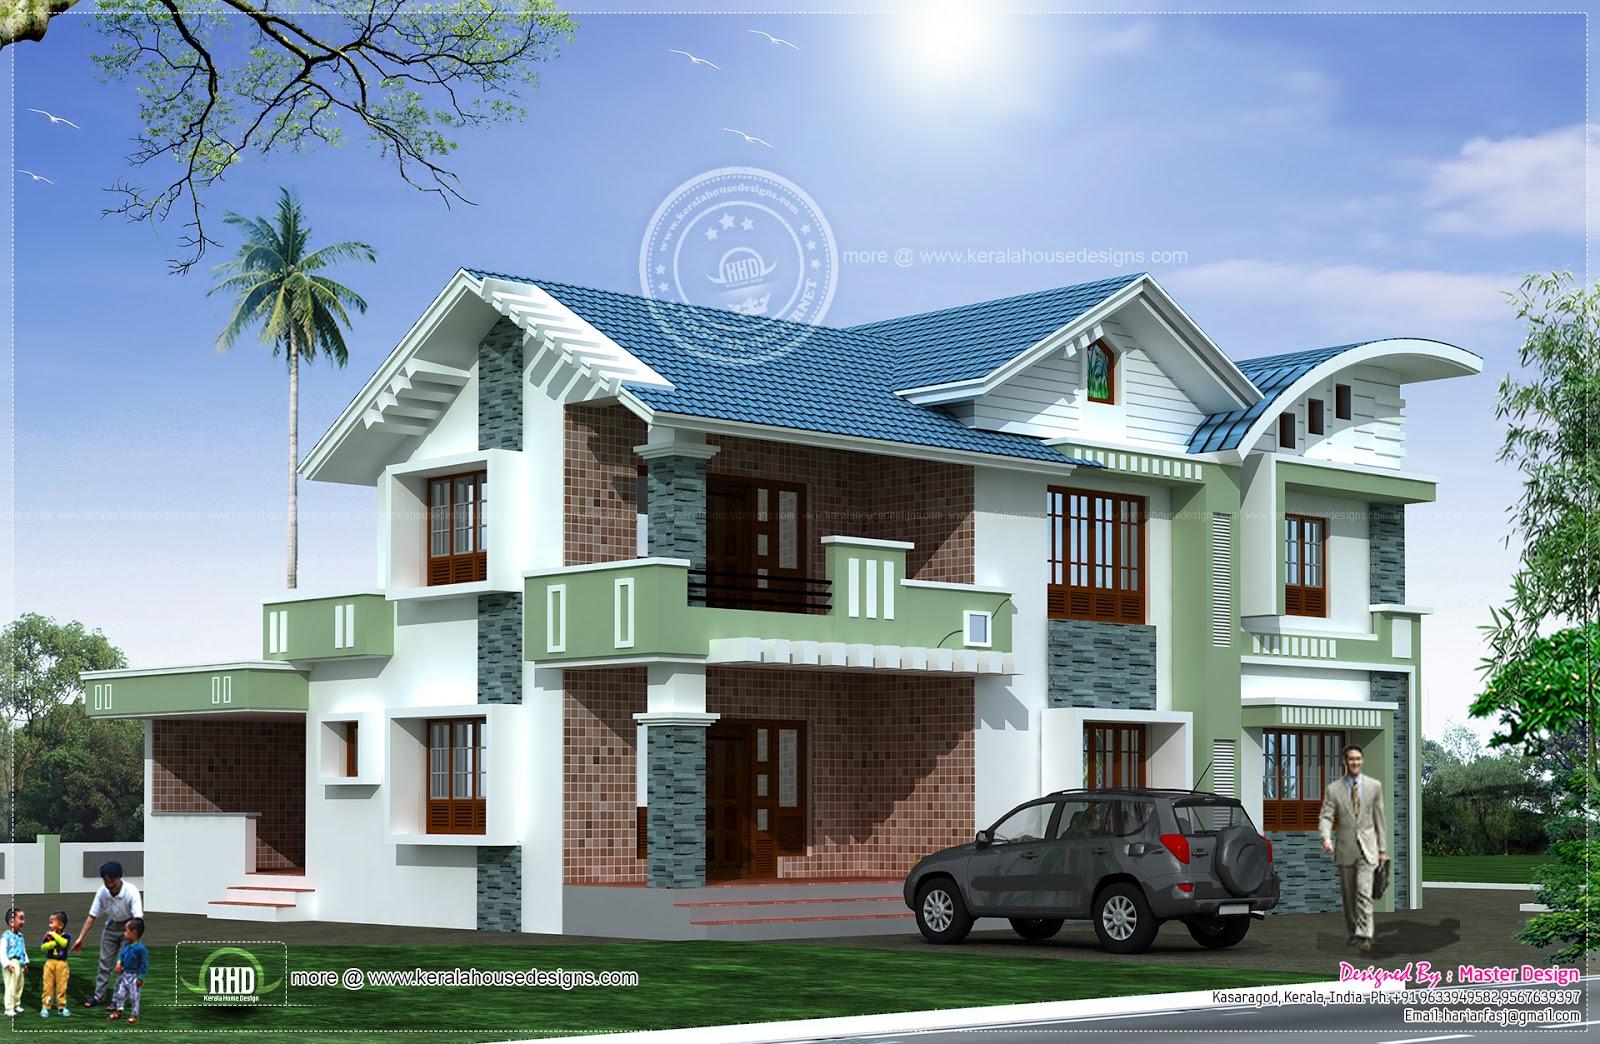 Modern mixed roof villa design kerala home design and for Kerala home designs 2013